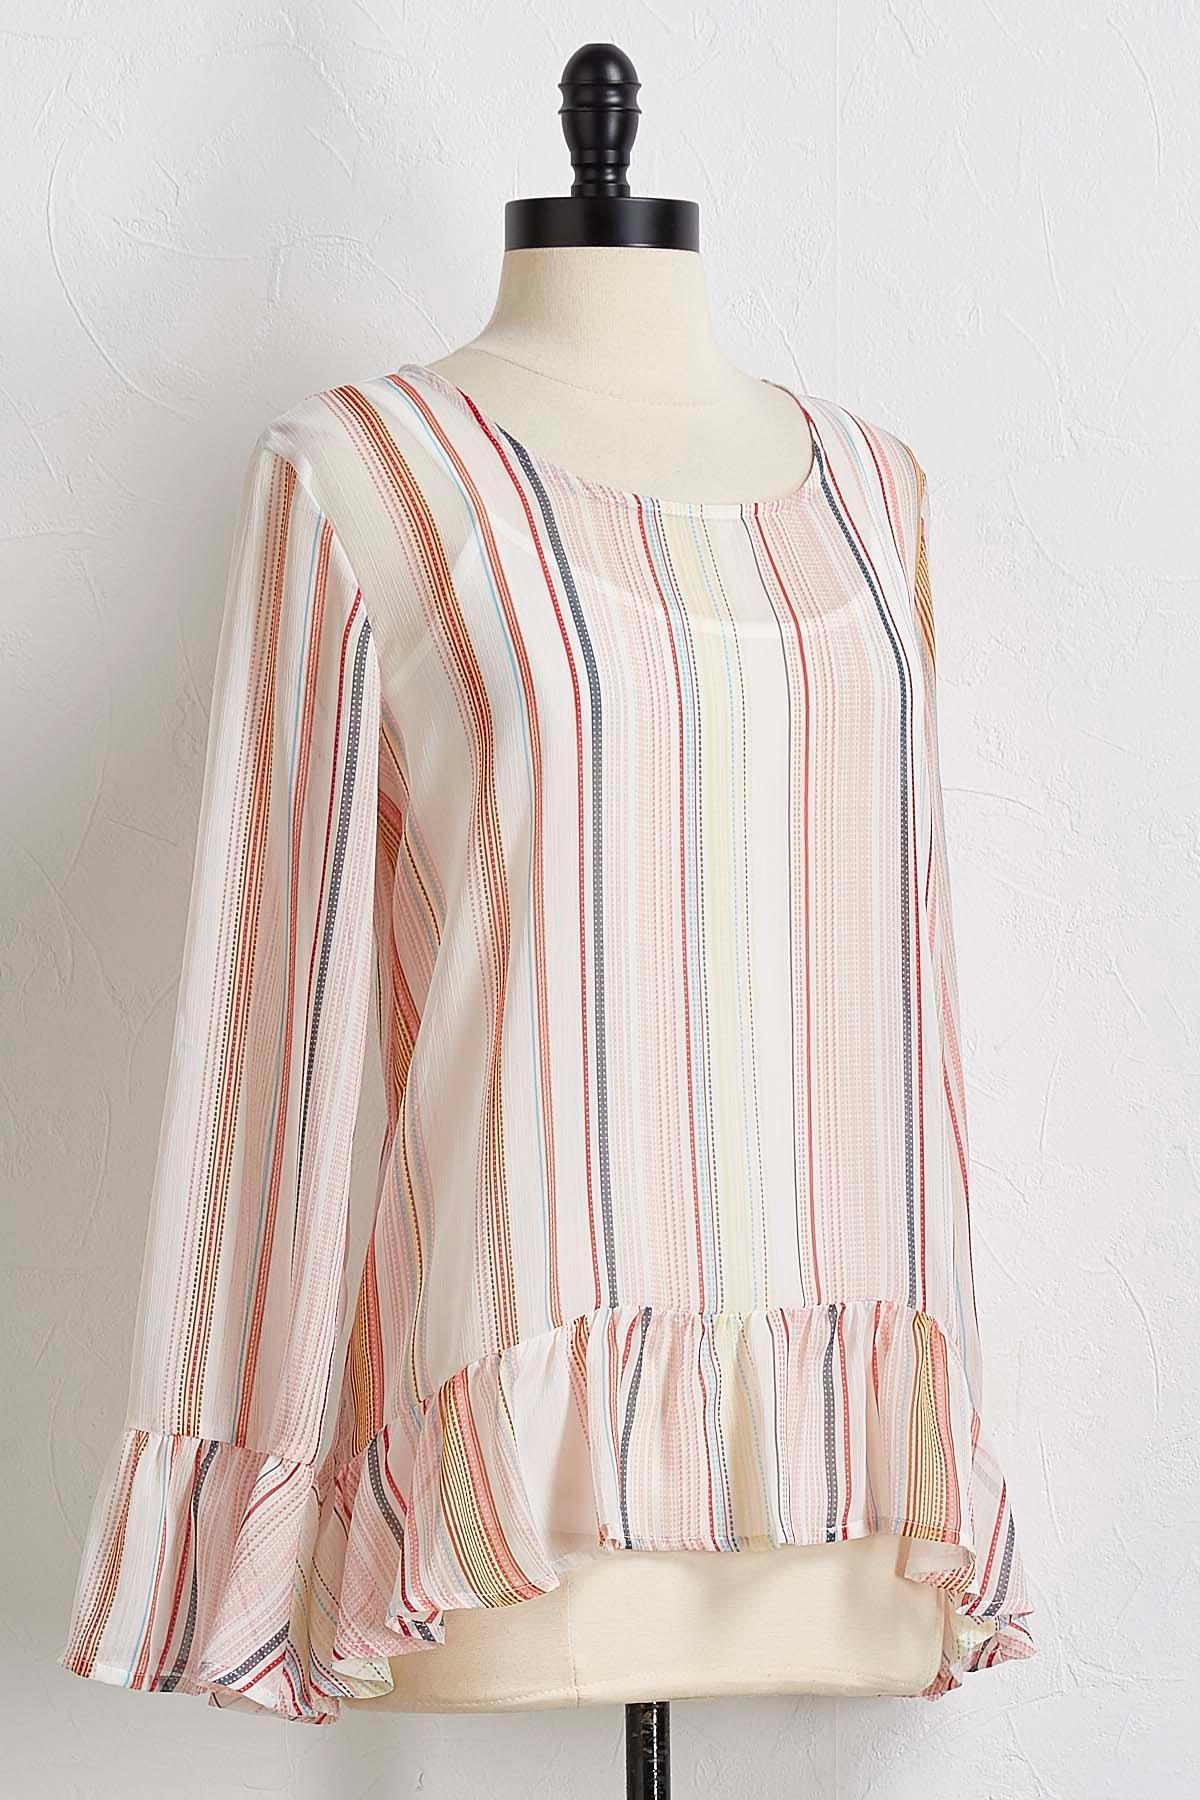 Layered Multi- Striped Top